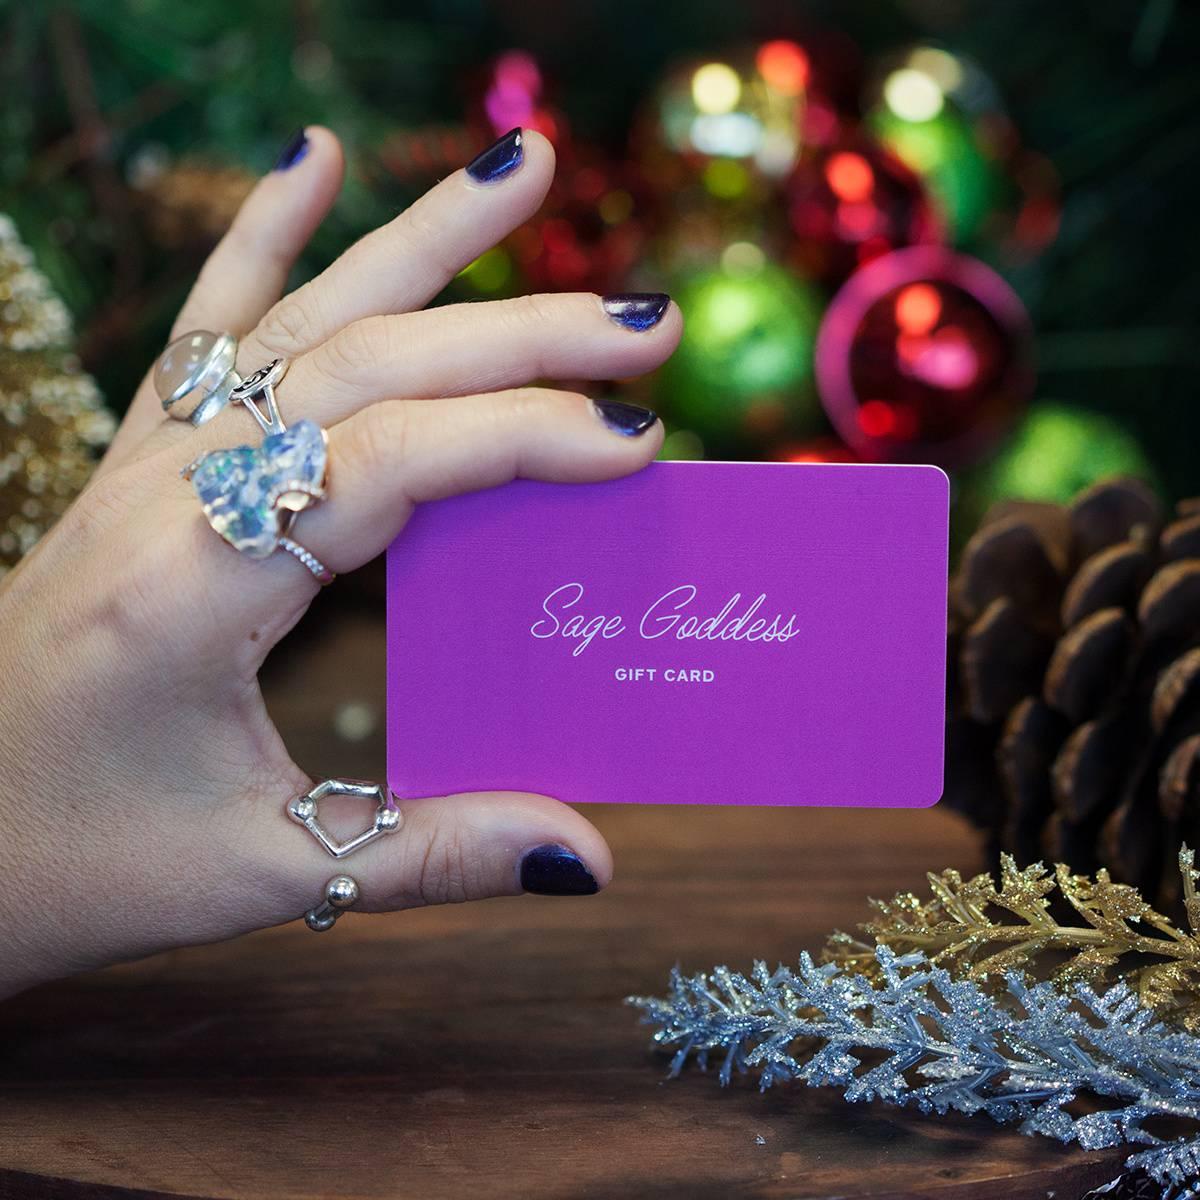 Sage Goddess Gift Cards